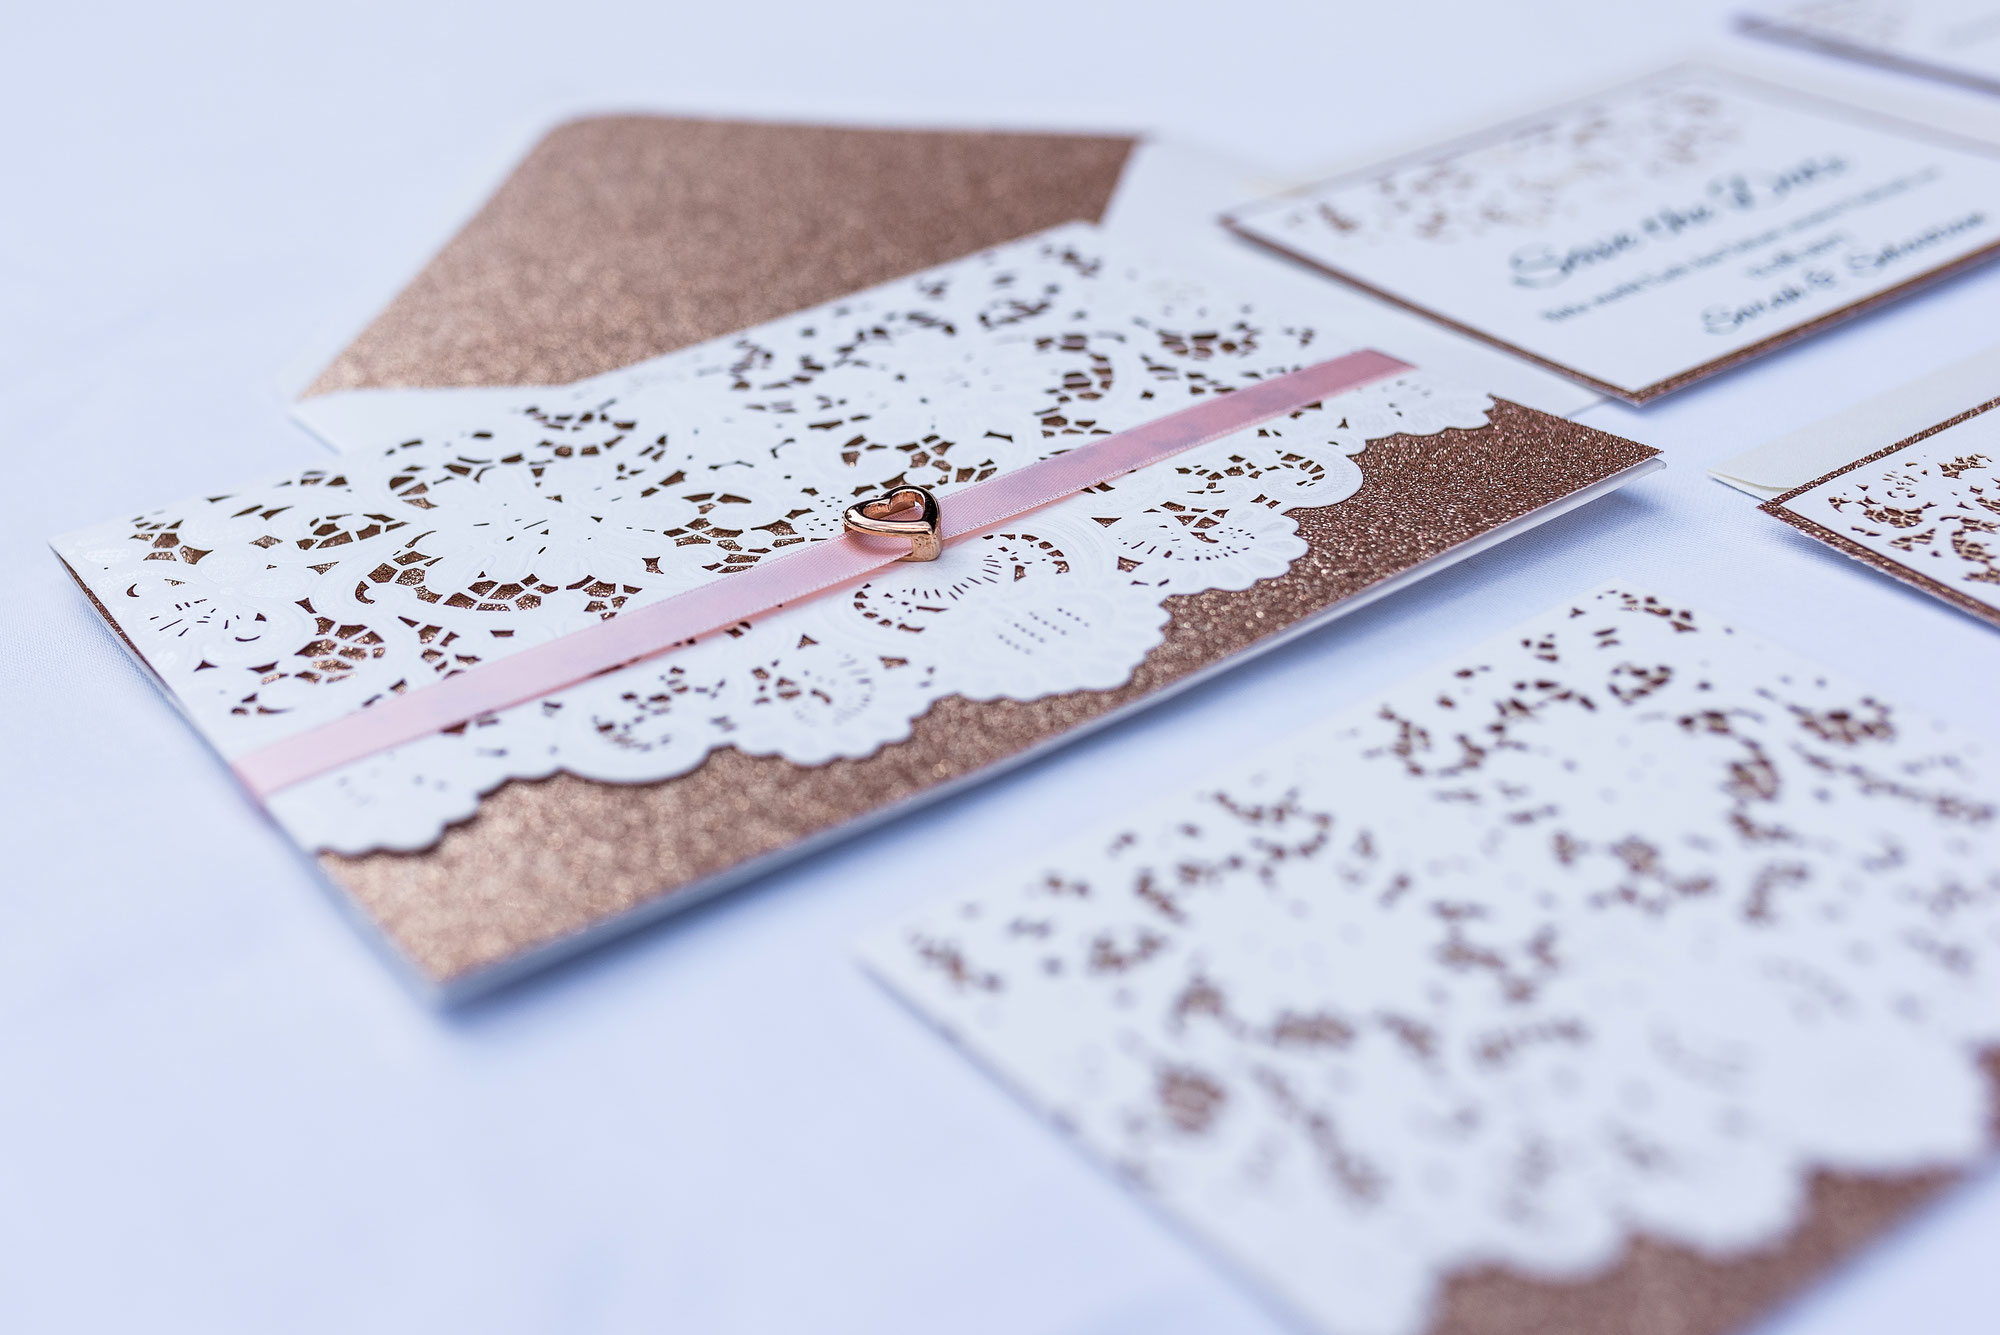 Hochzeitskarten Unikate Handgefertigt Aa Kreativ Zentrum